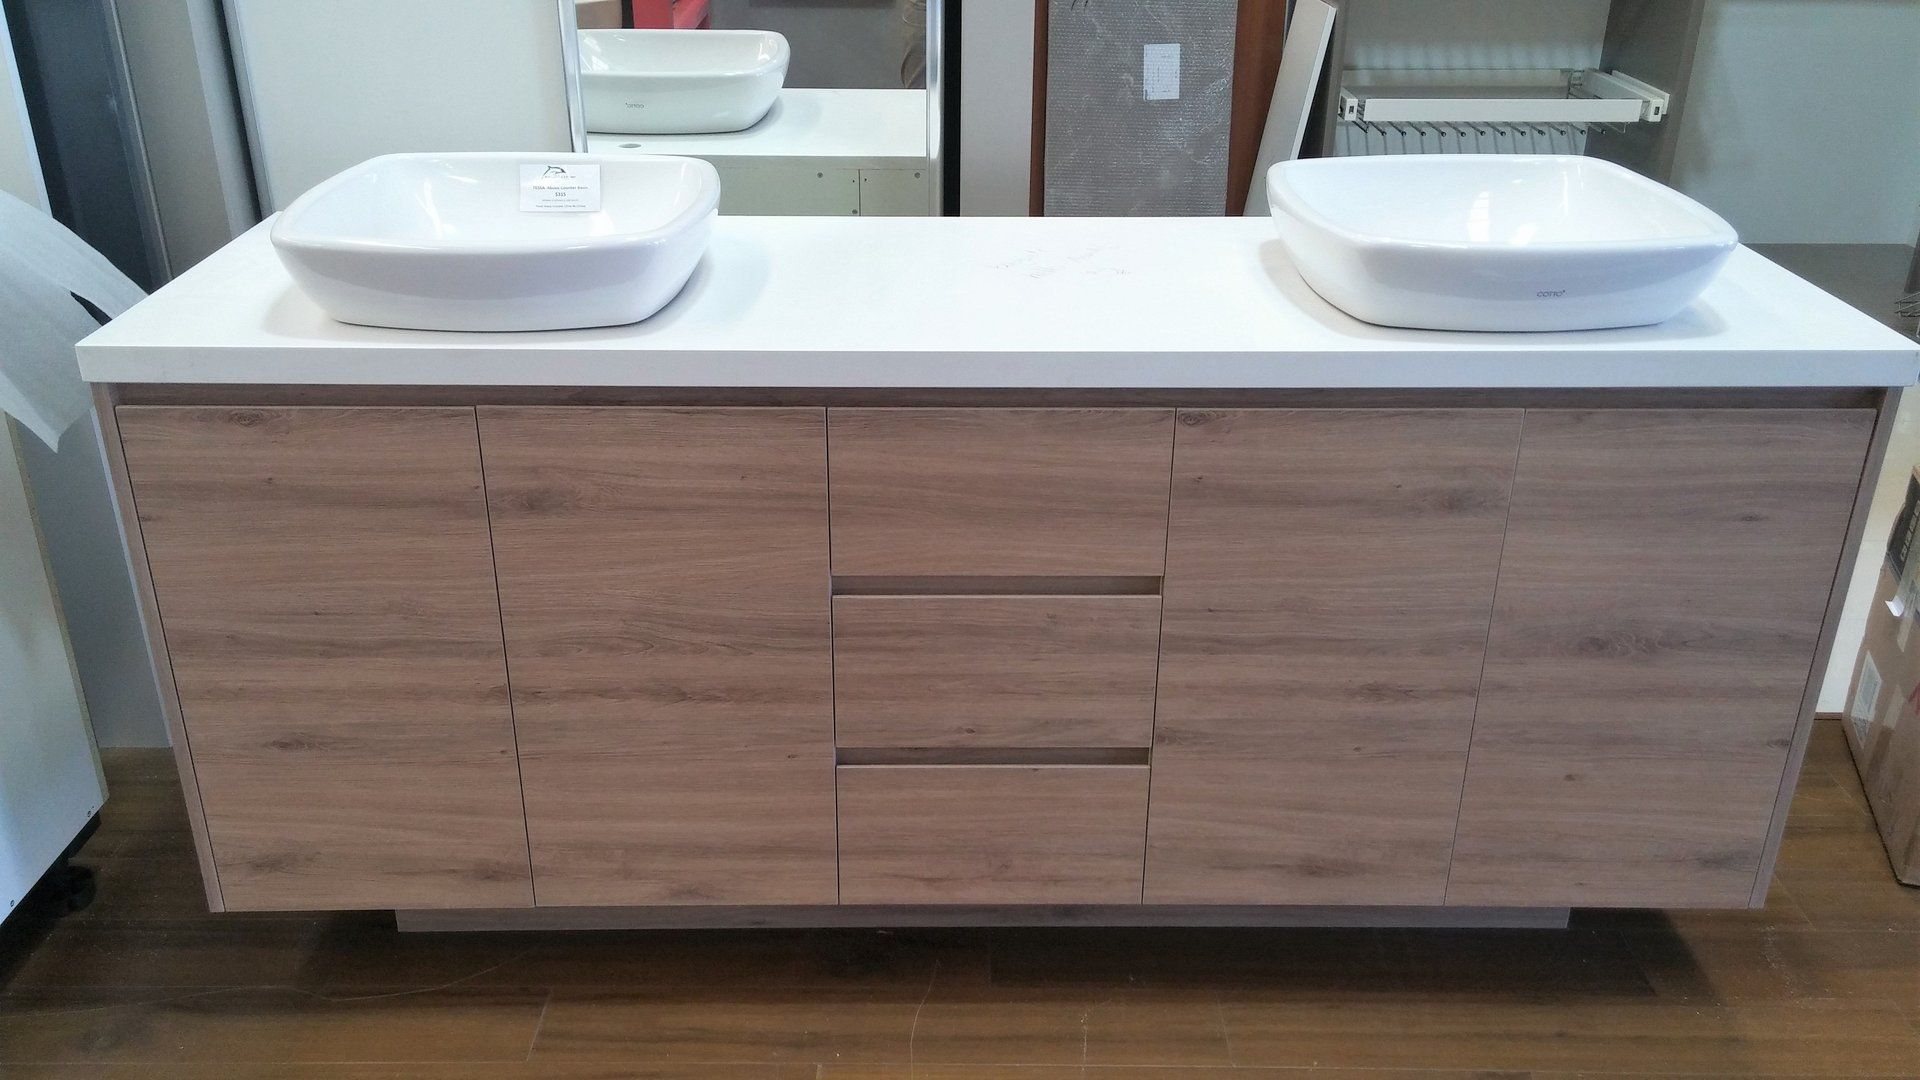 Vanities | Melbourne | Bayside Bathroom & Kitchen Centre ...